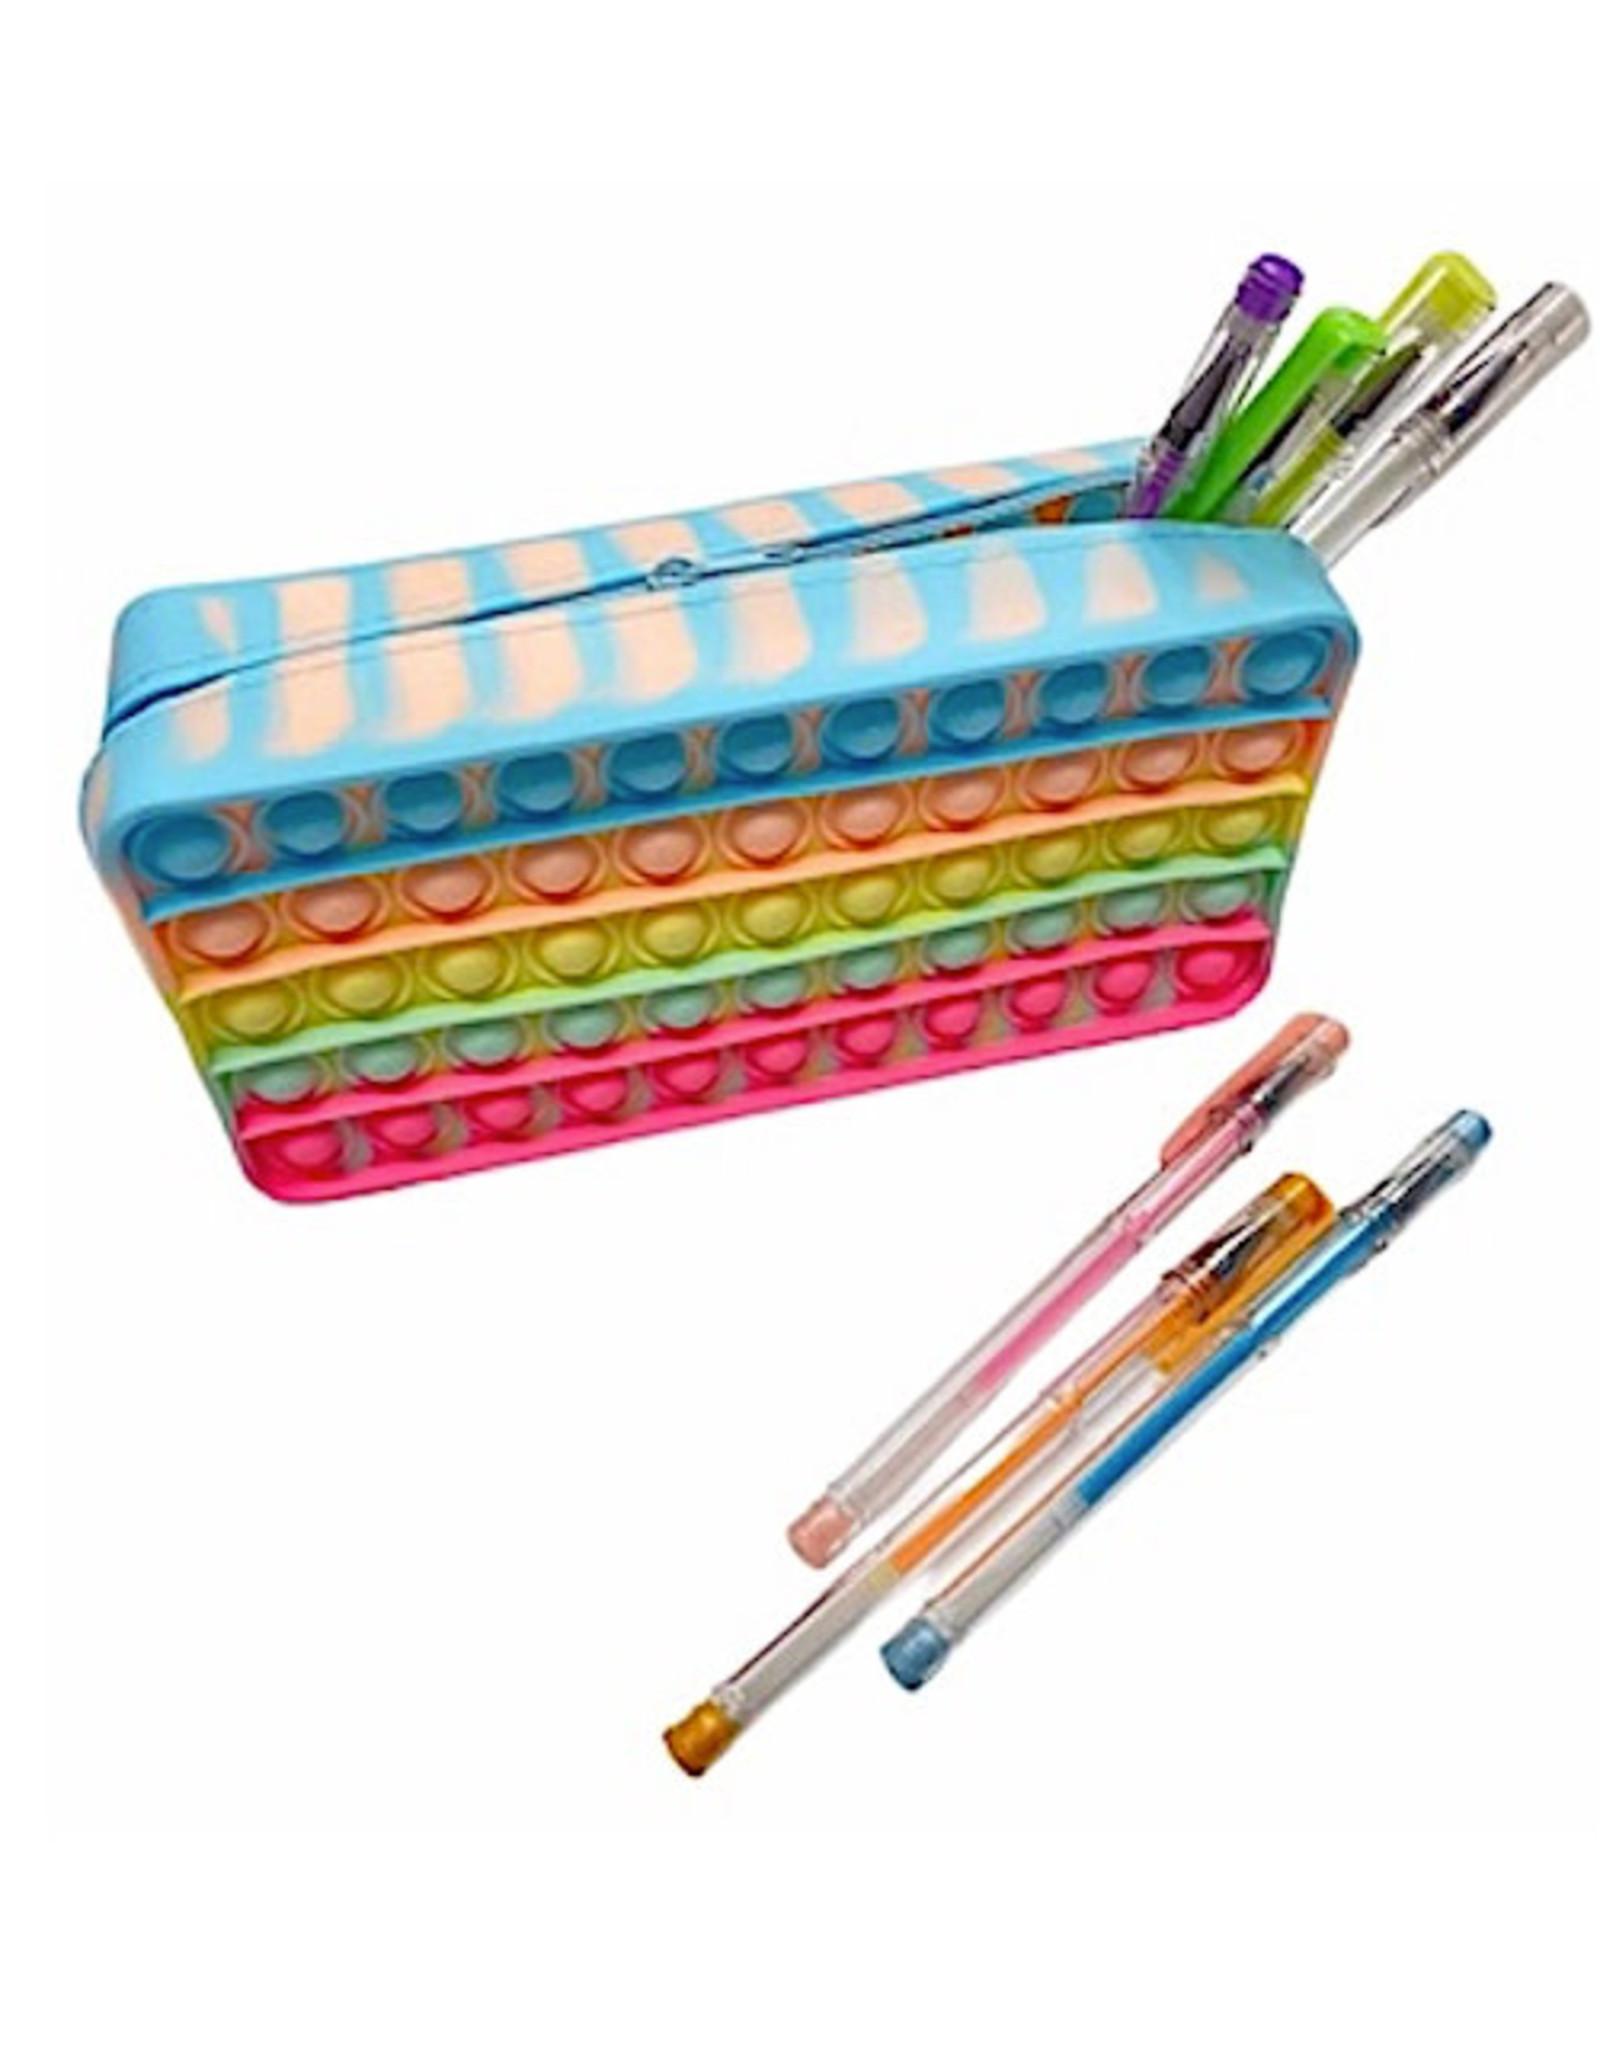 Confetti Corp Crazy Snap Pencil Case